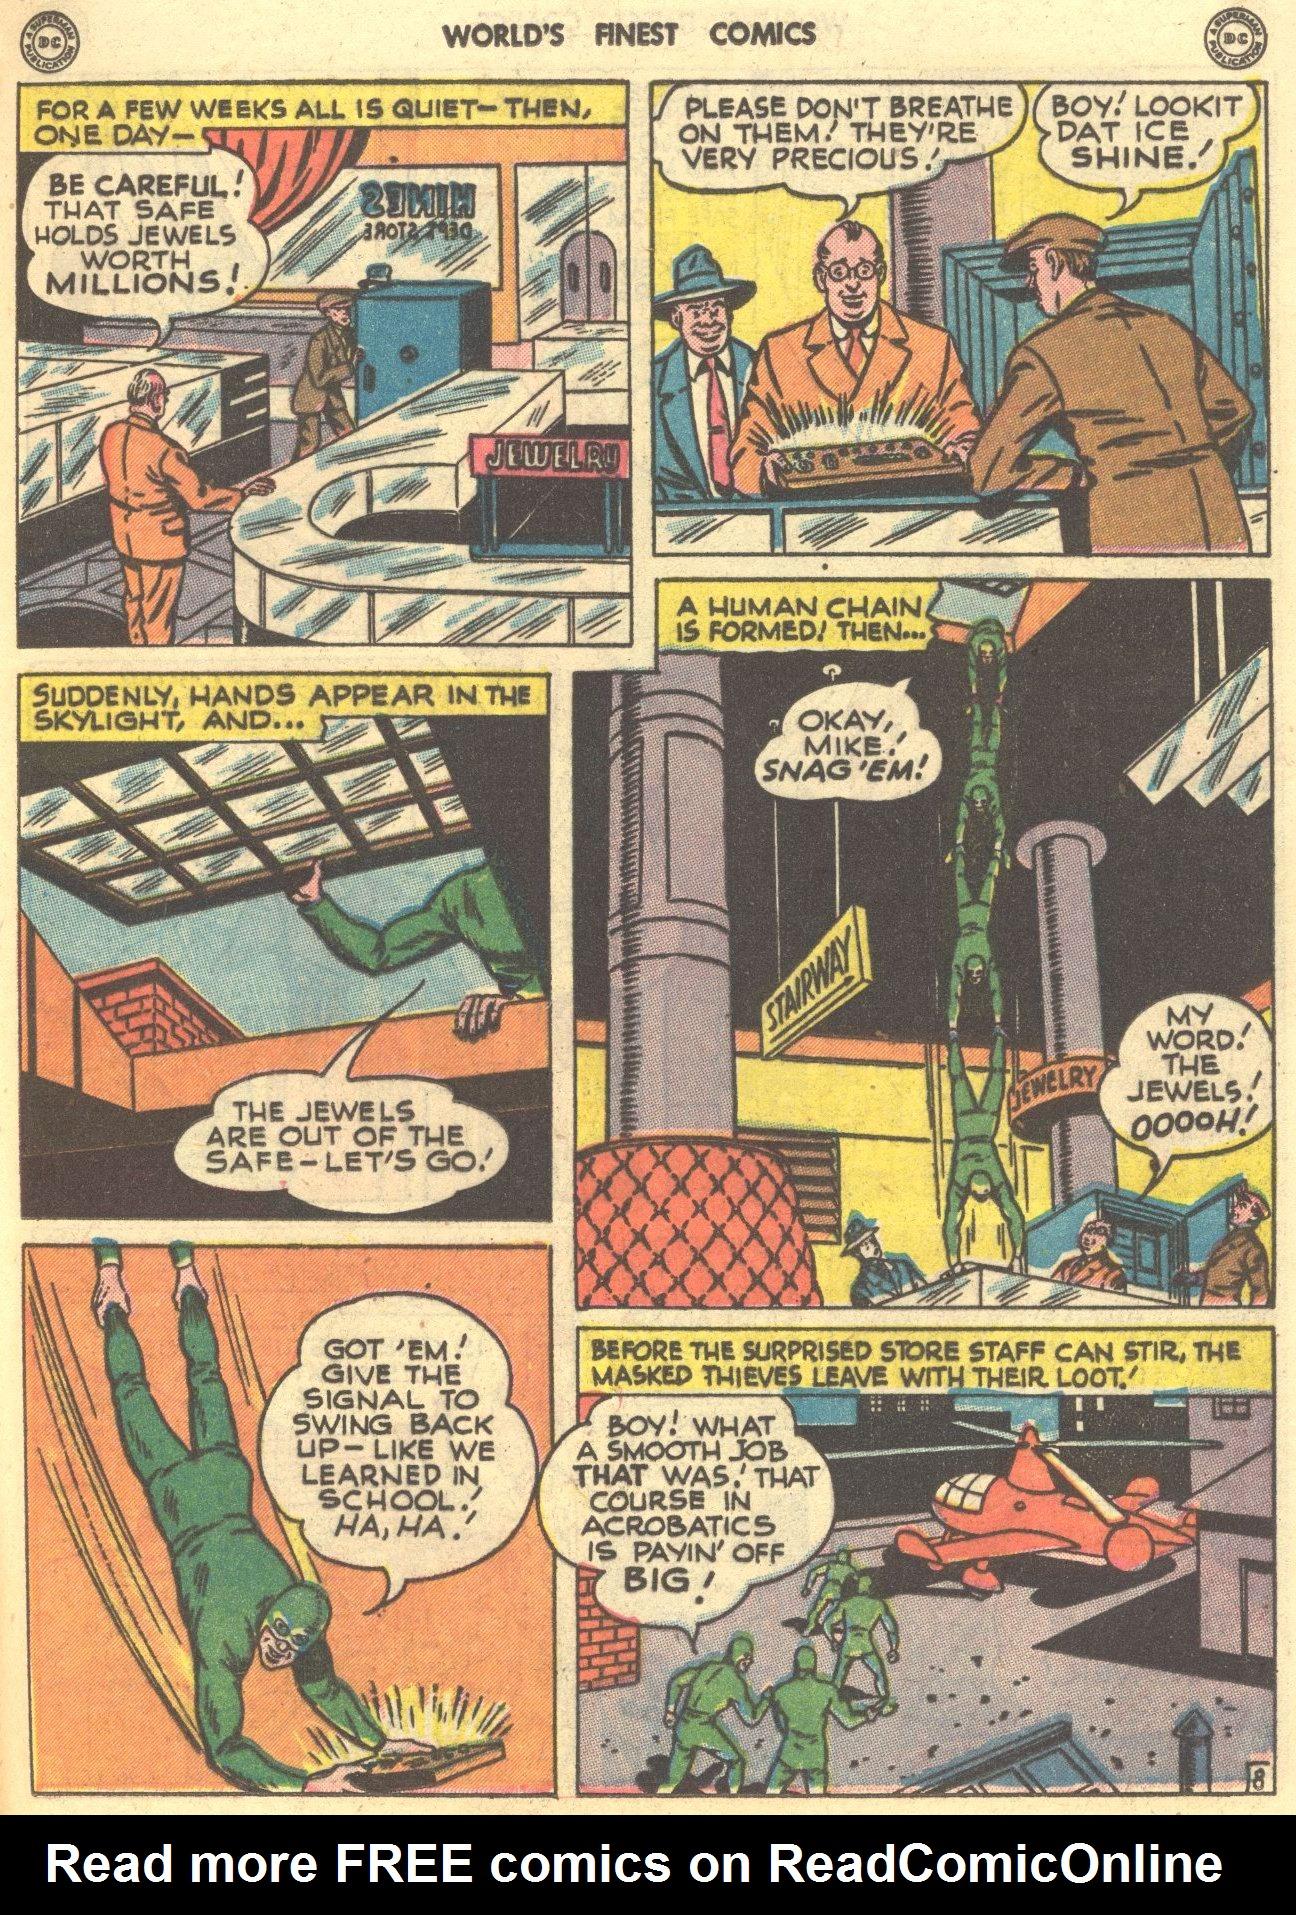 Read online World's Finest Comics comic -  Issue #28 - 36